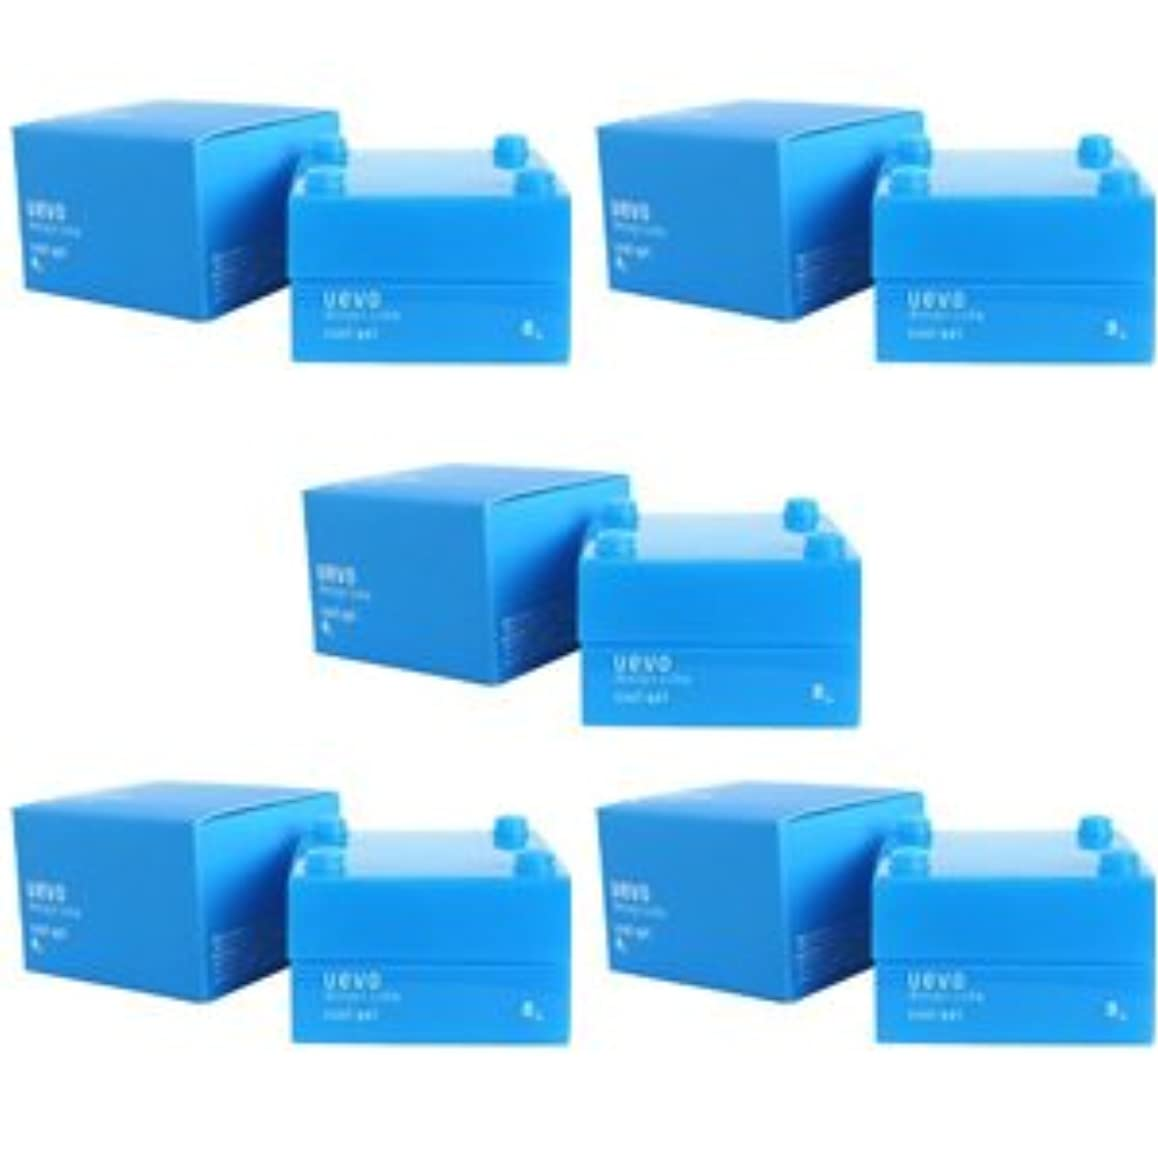 【X5個セット】 デミ ウェーボ デザインキューブ クールジェル 30g cool gel DEMI uevo design cube